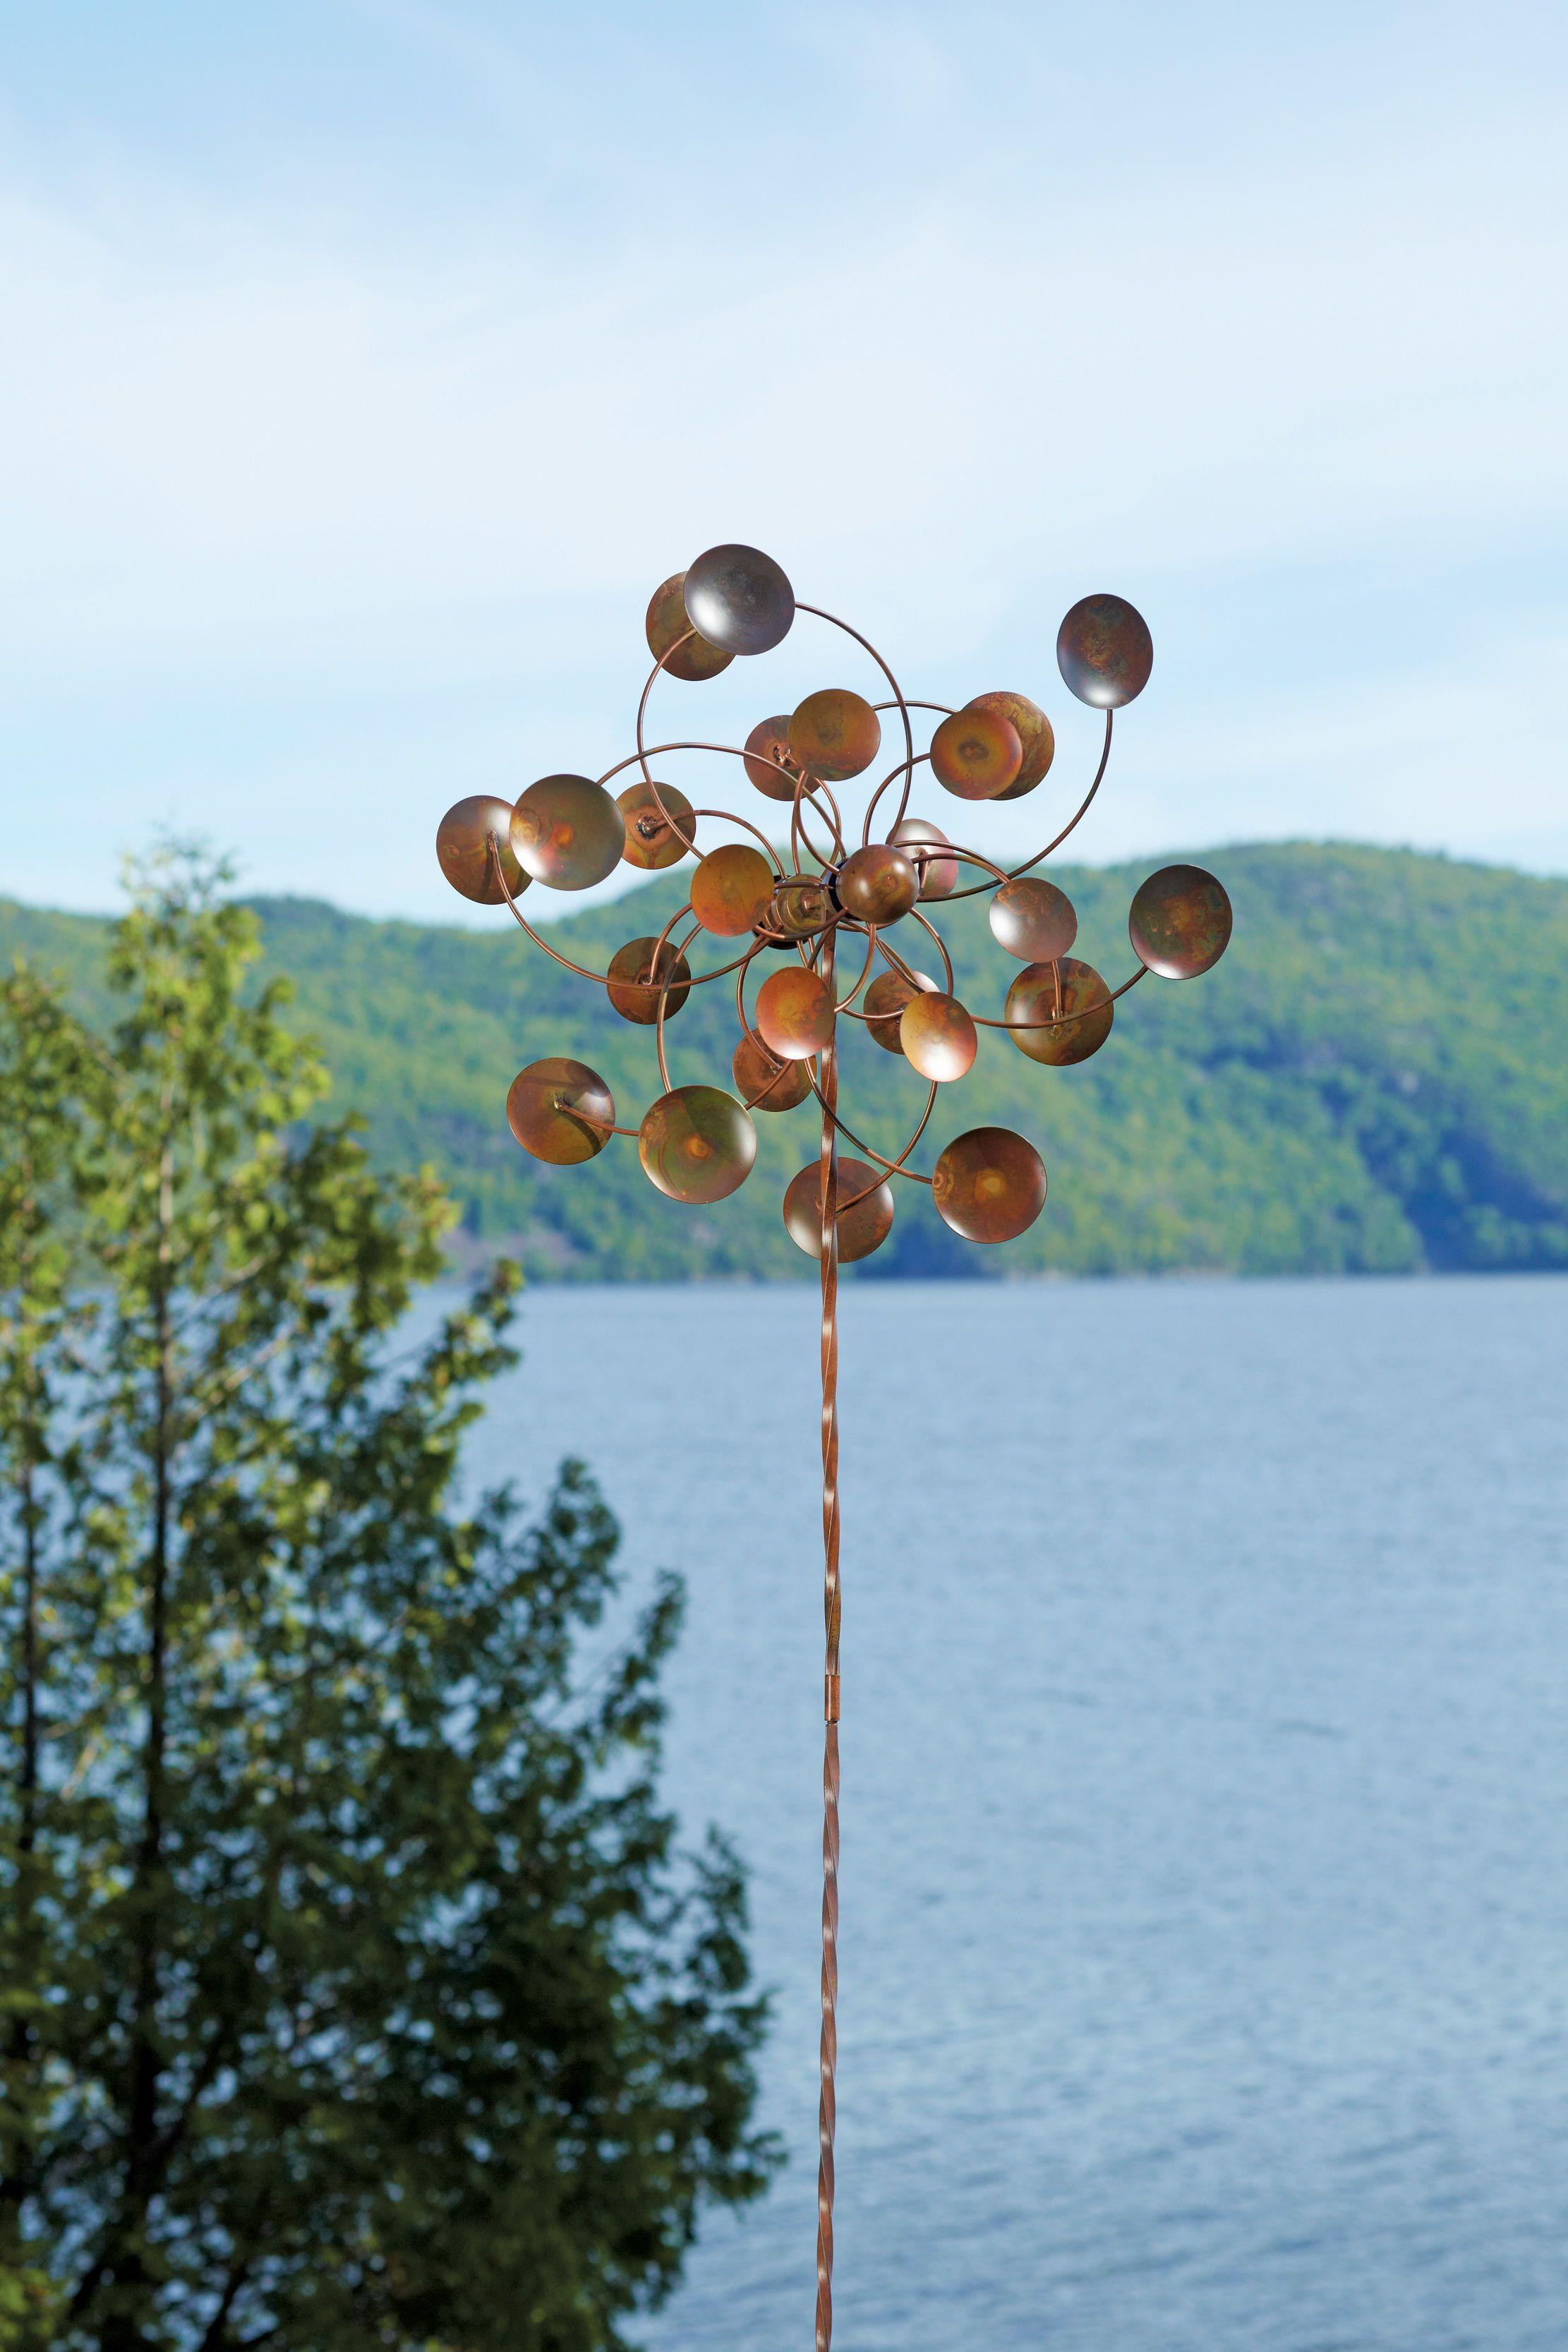 Metal Wind Spinners: Double Disc Wind Spinner | Gardeners.com